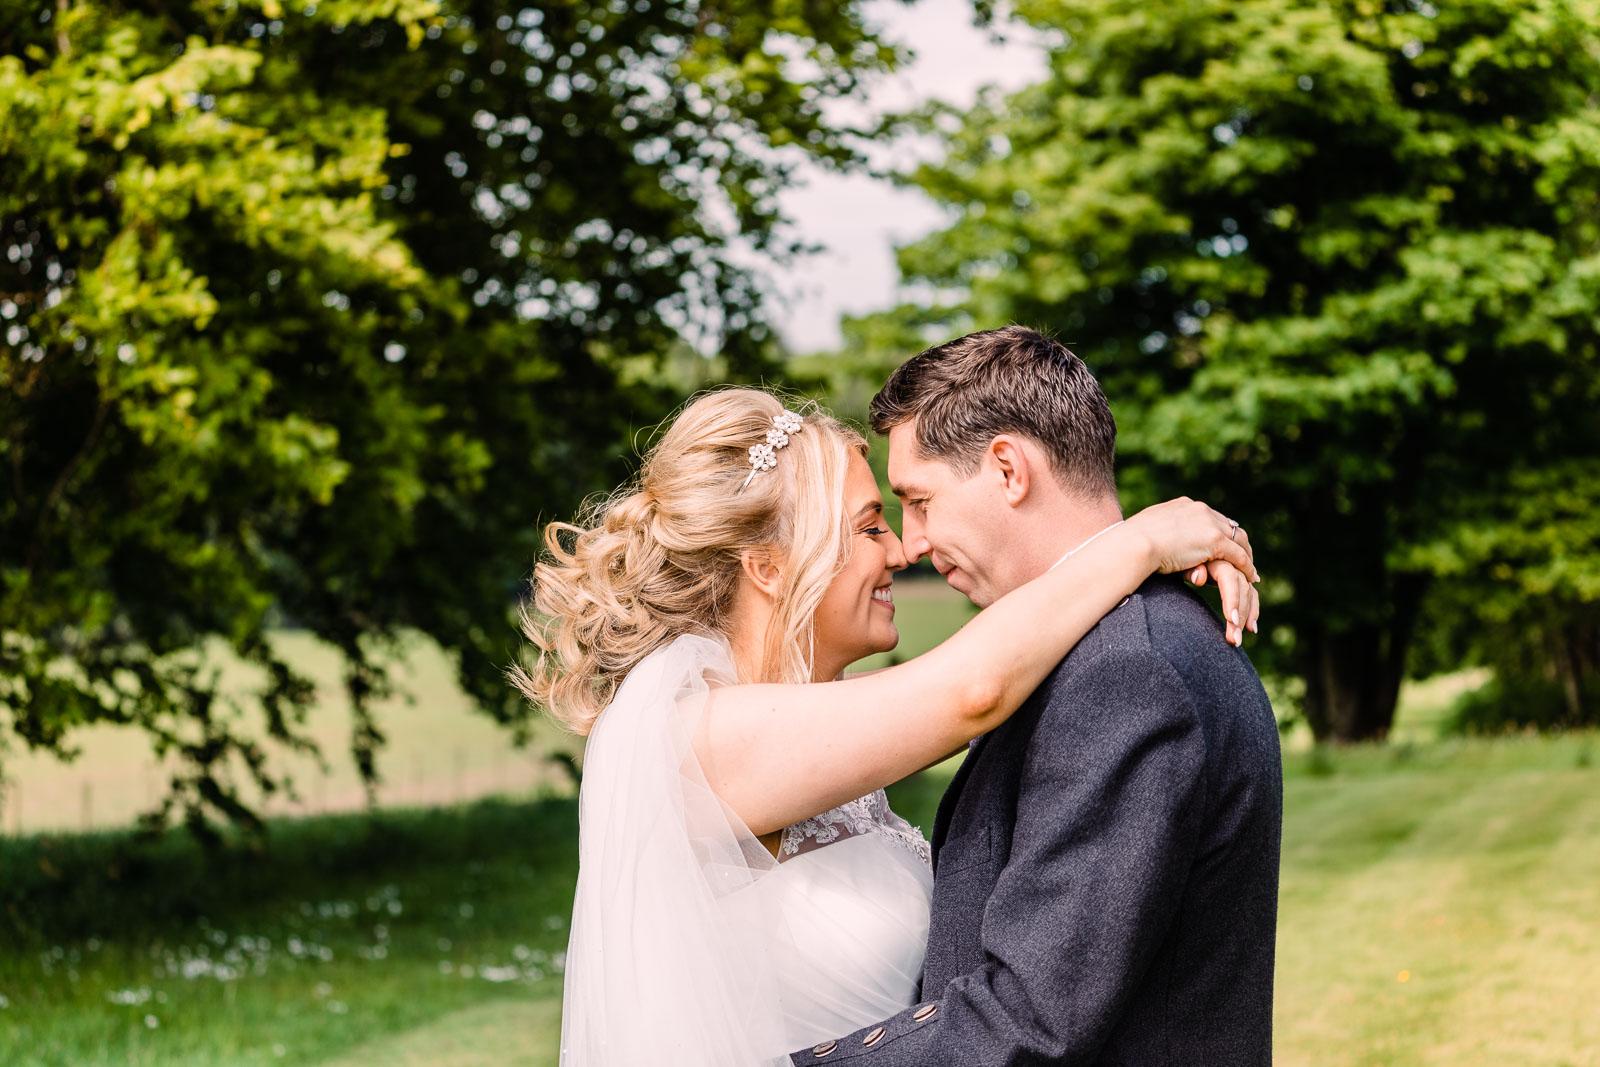 cornhill_castle_wedding_biggar_dearlyphotography (232 of 448).jpg